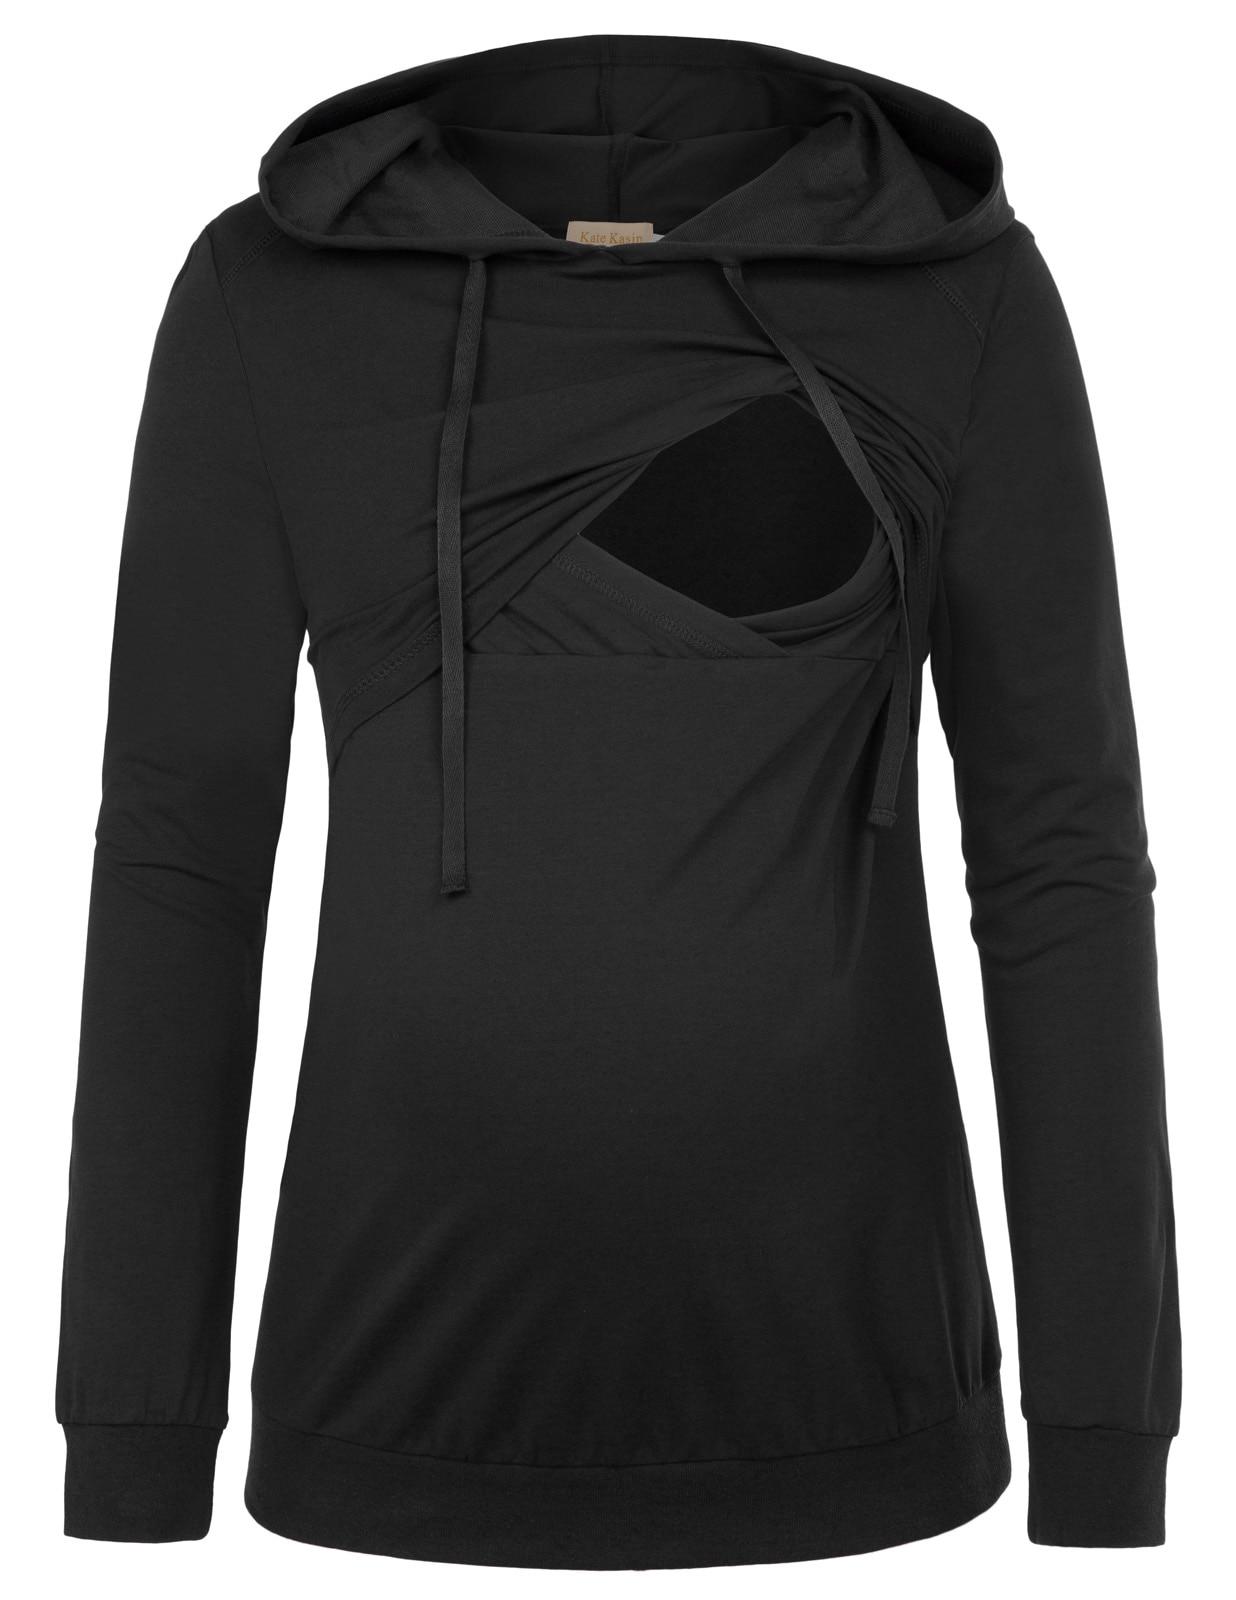 plus size Women clothing Long Sleeve Maternity Nursing Breastfeeding Hooded Tops